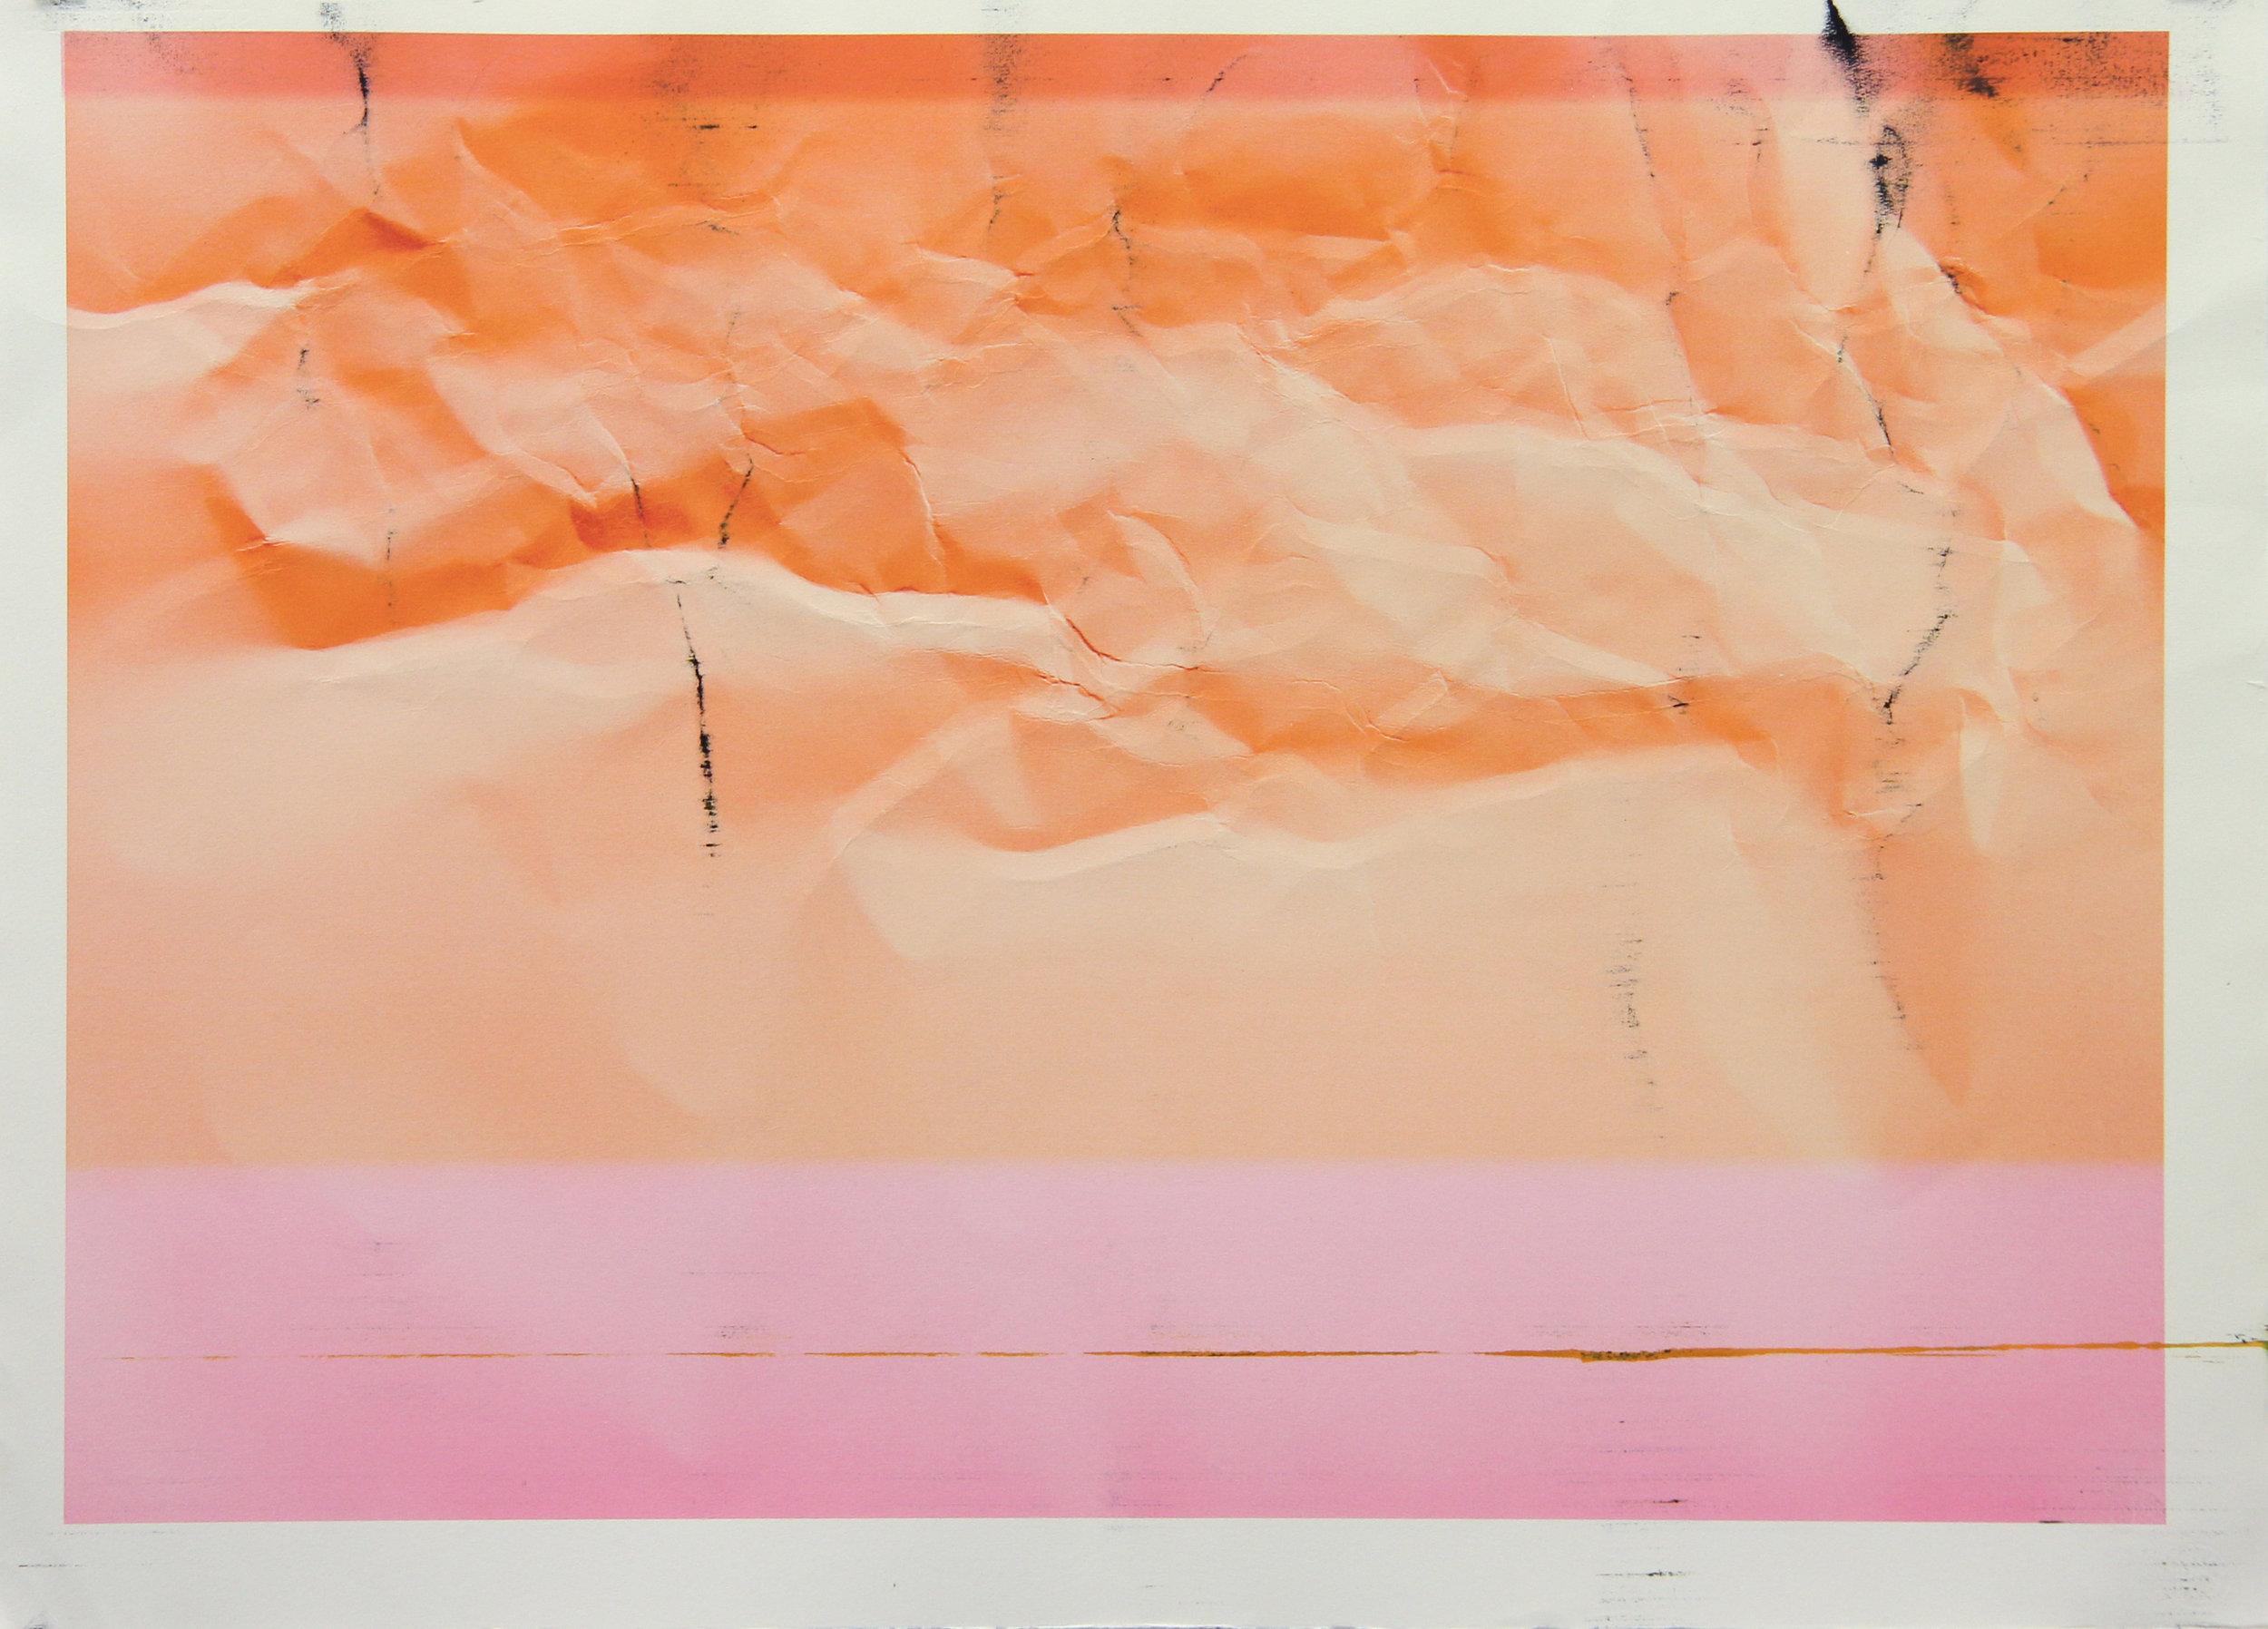 Tinted Headstrike #14, 2015 Unique giclée print, 107 x 78 cm